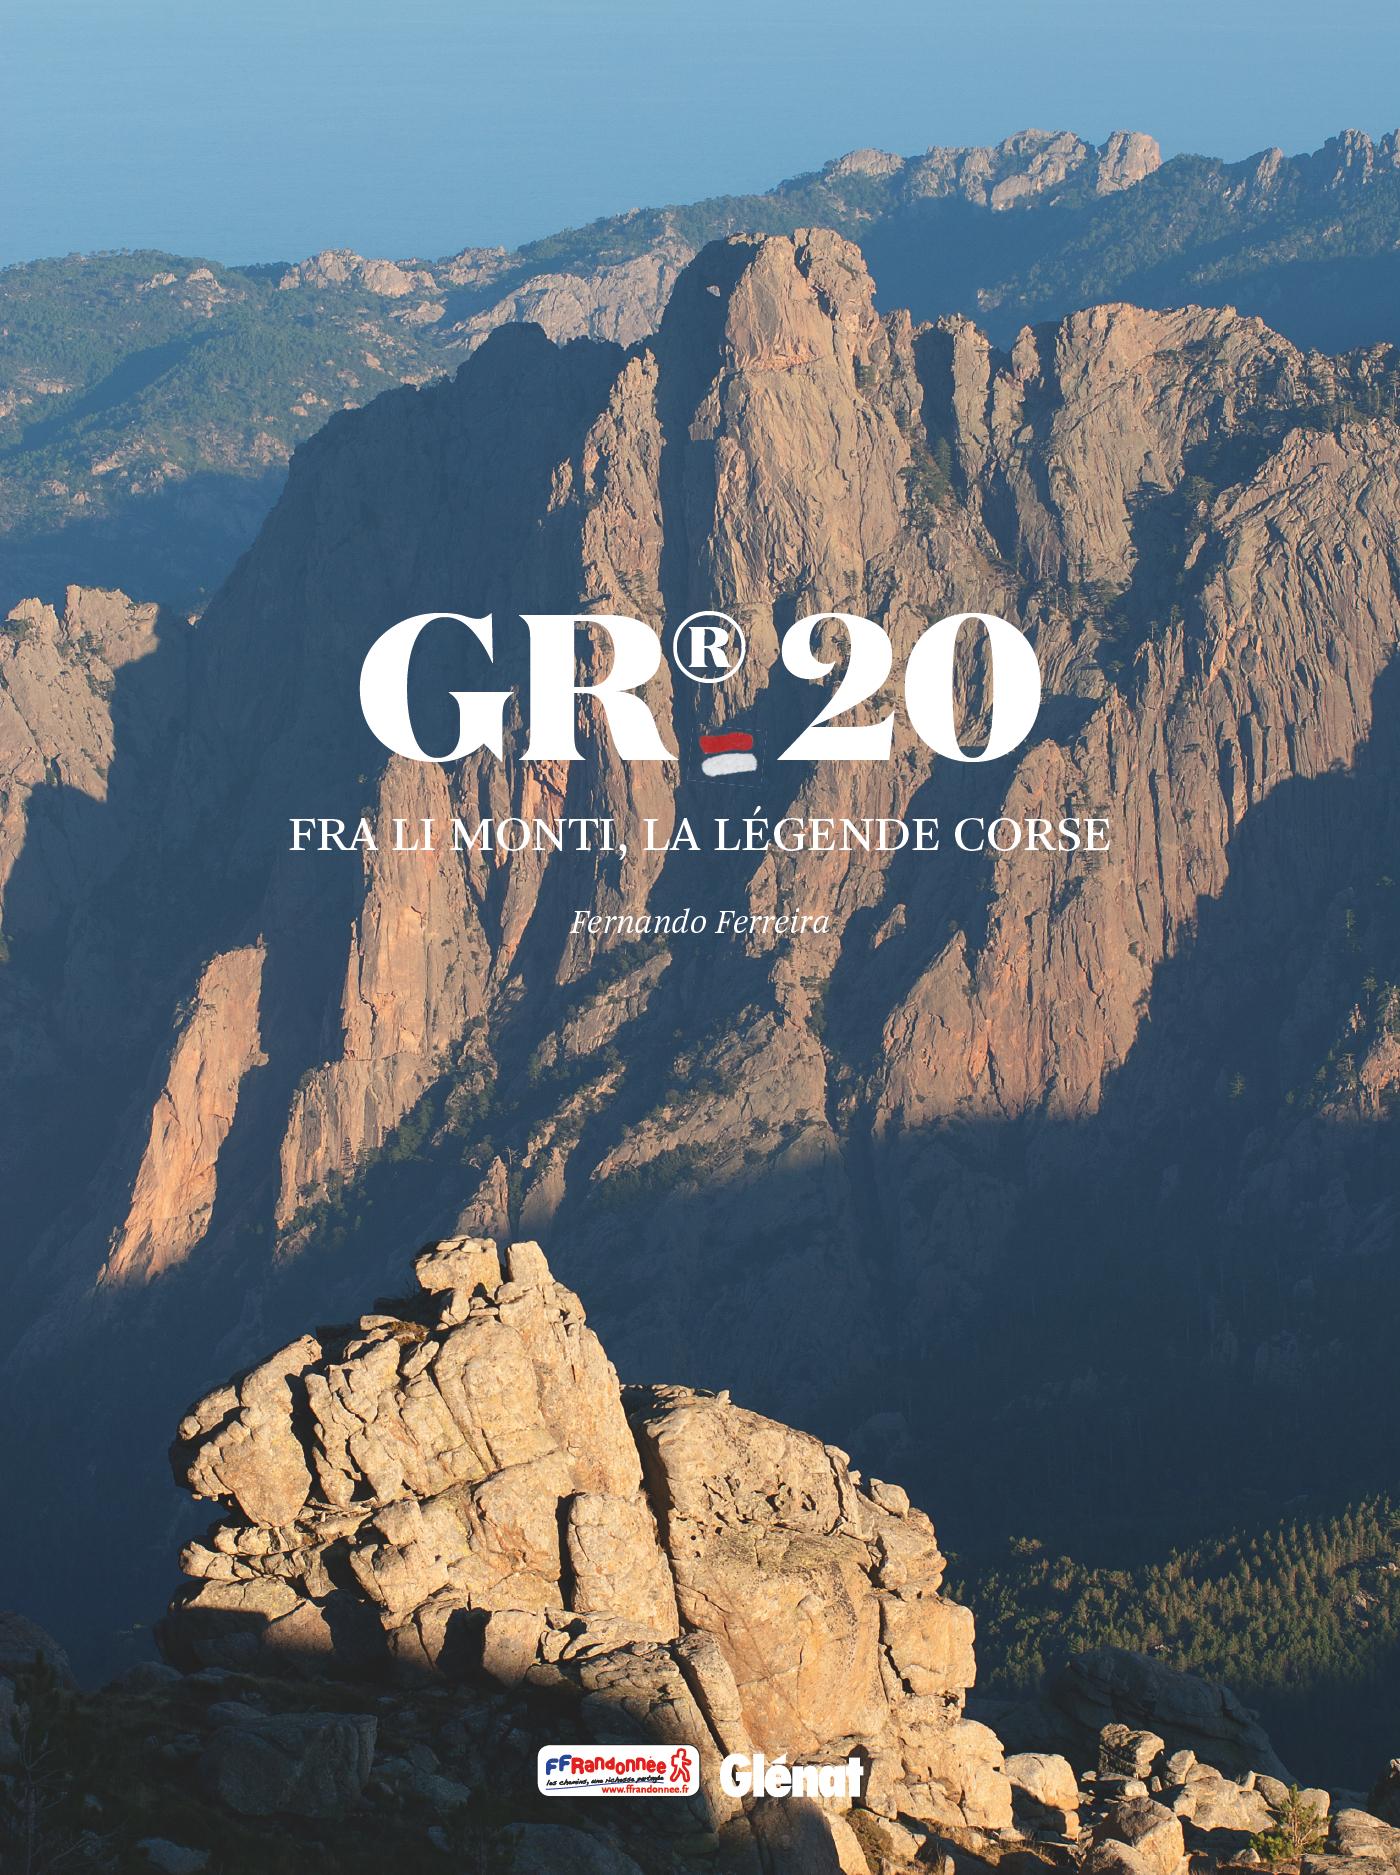 «GR20 Fra li monti, la légende corse» par Fernando Ferreira